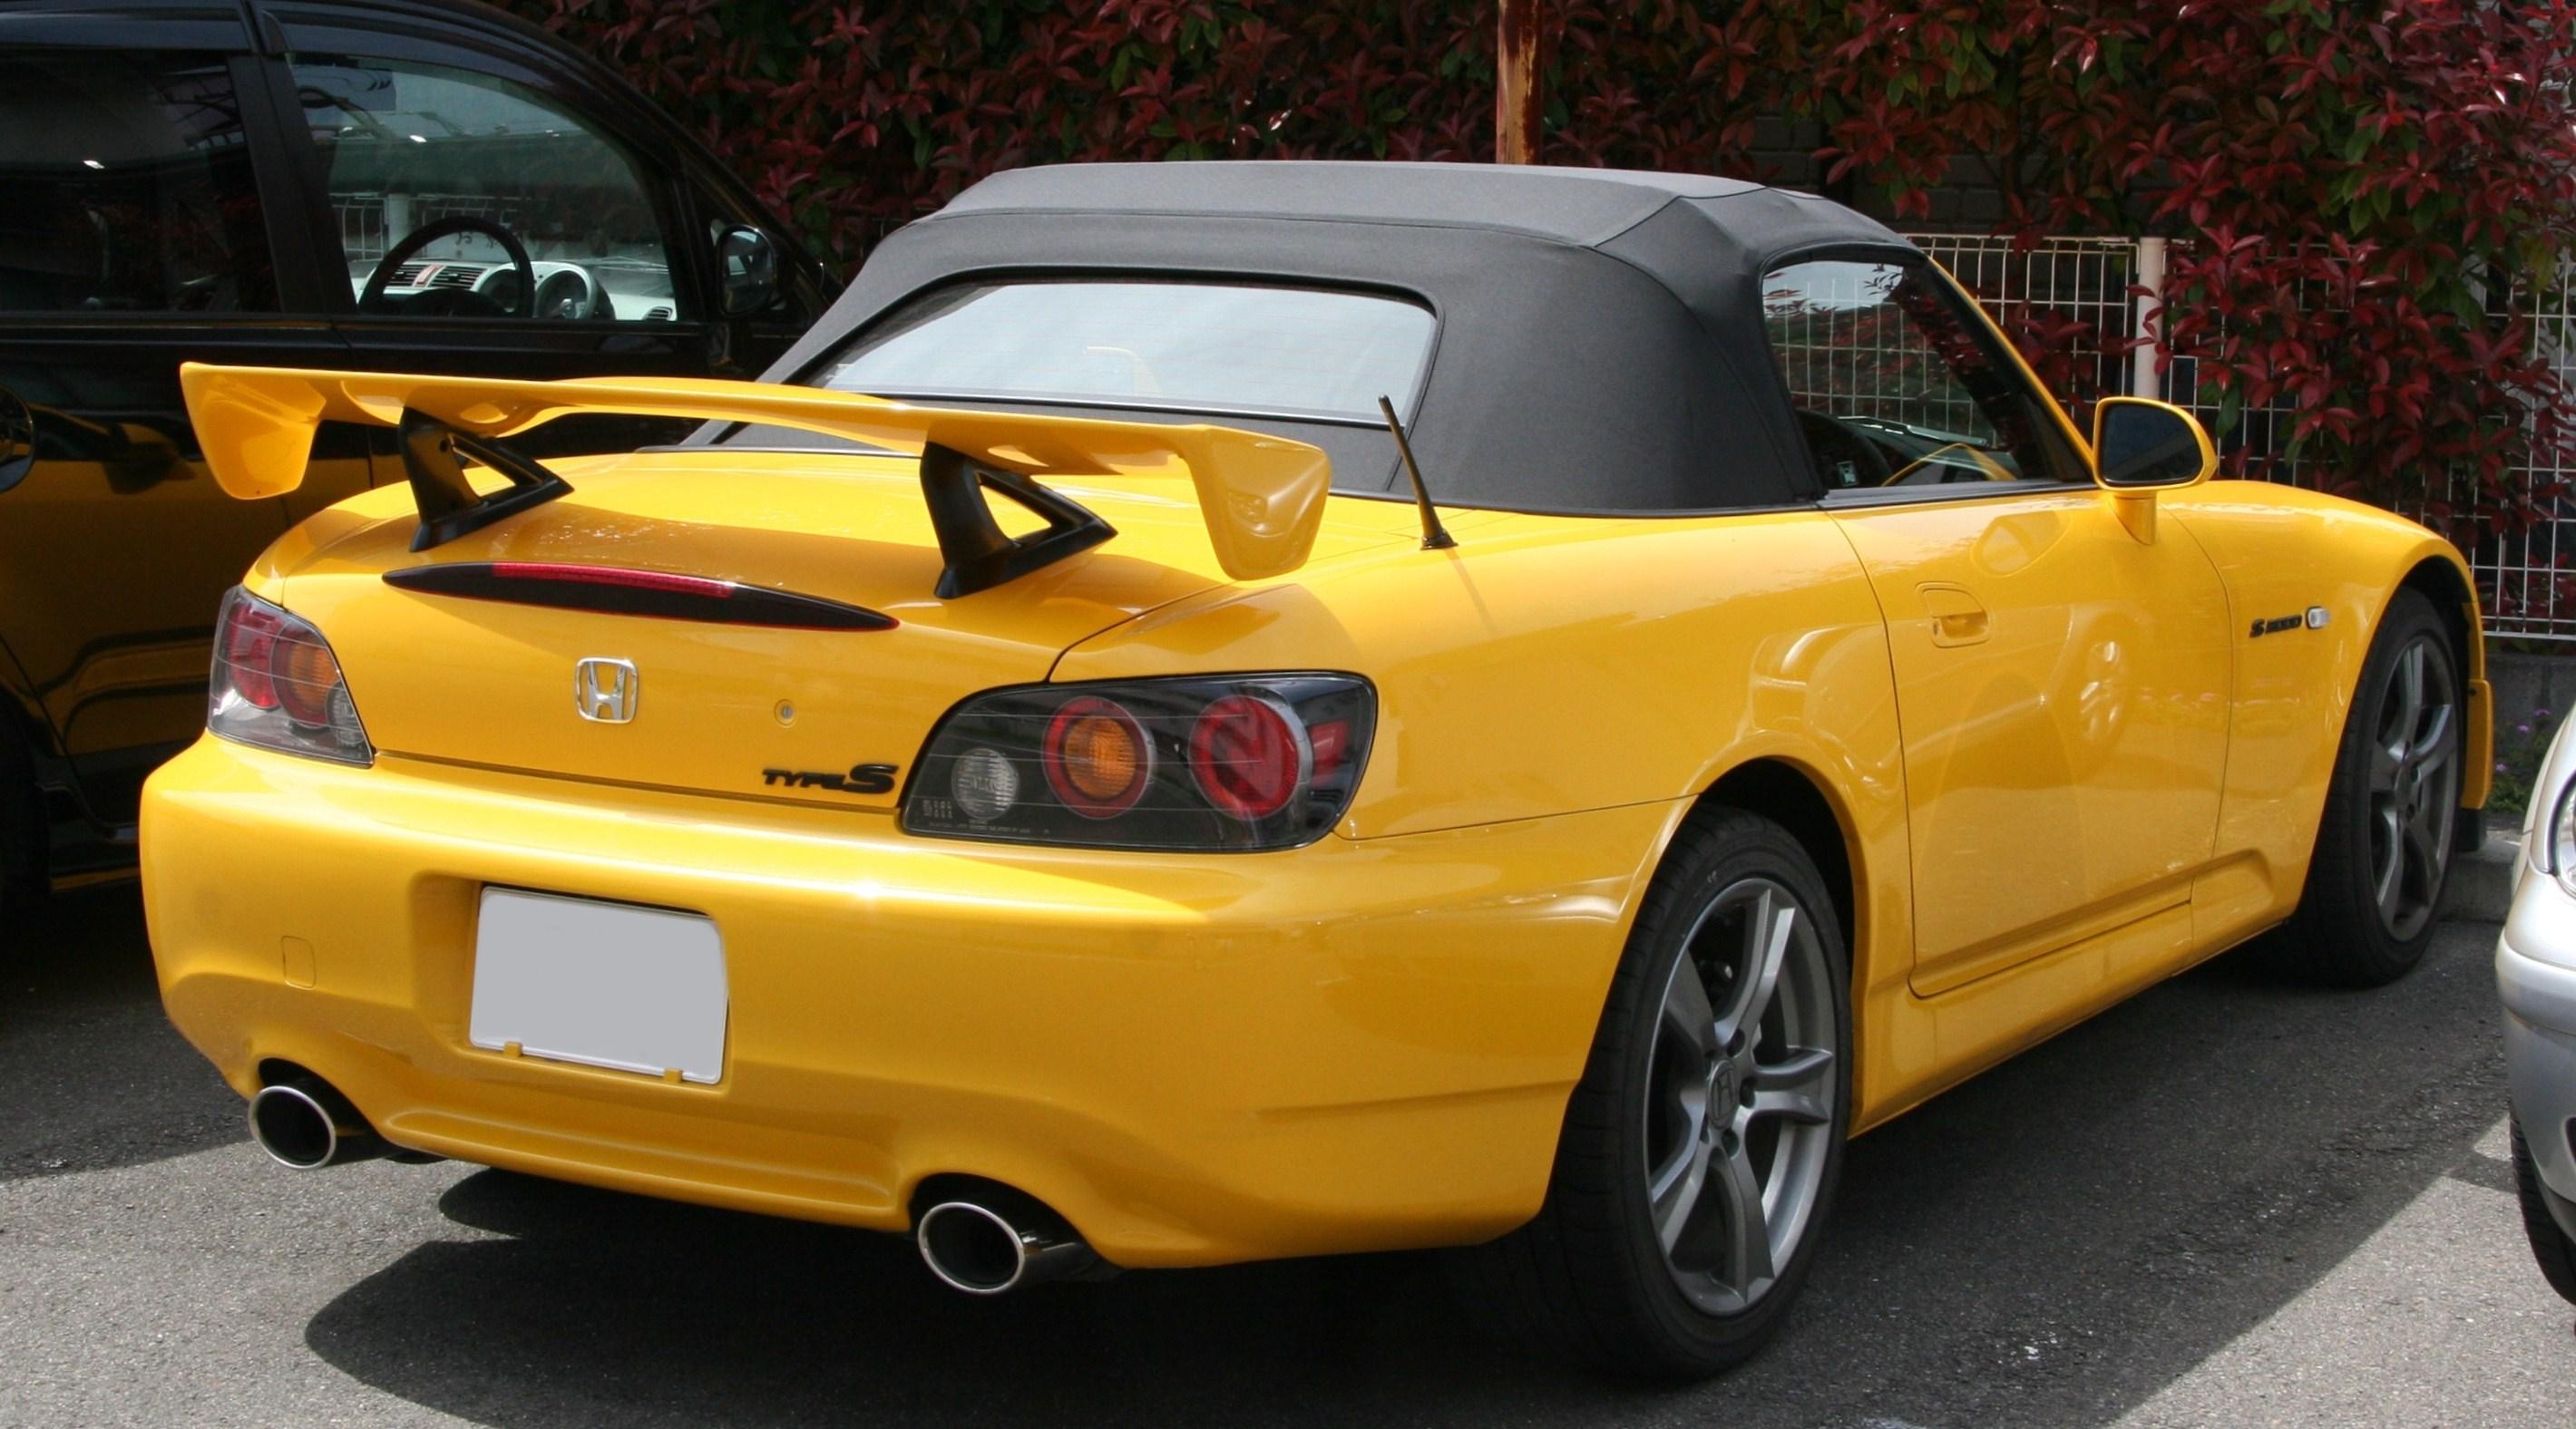 File:Honda S2000 Type S rear.jpg - Wikimedia Commons